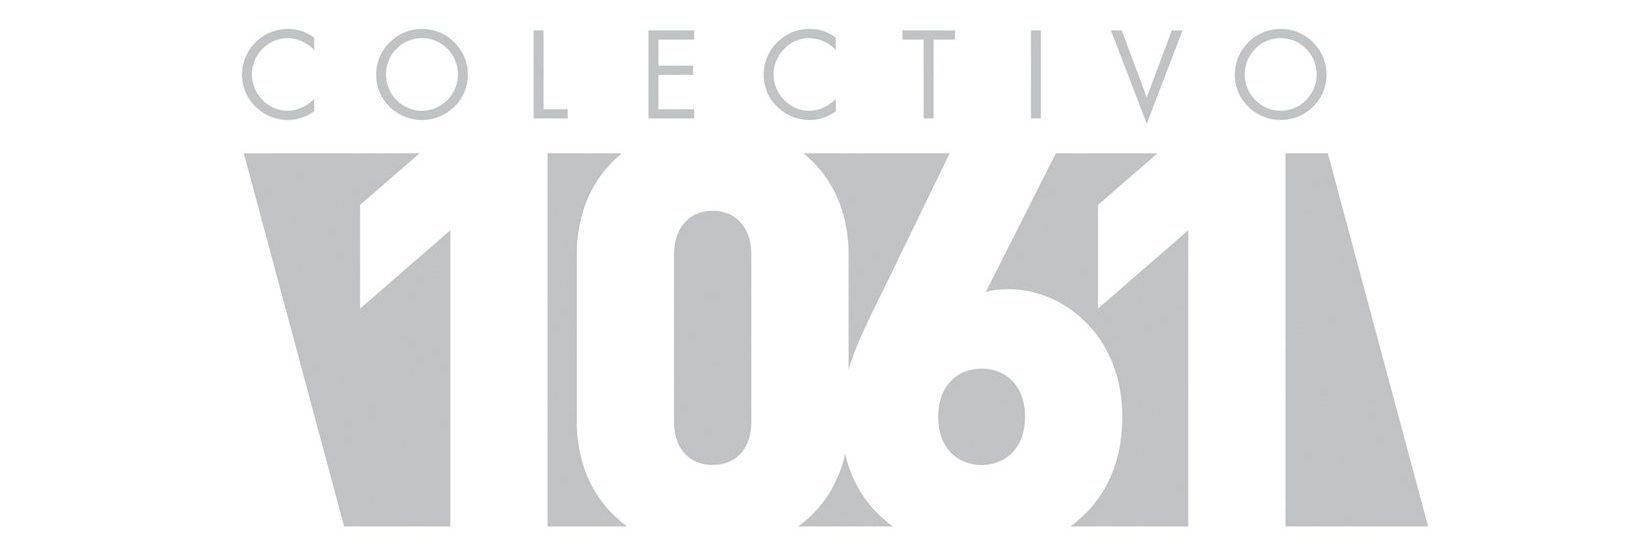 Colectivo1061 Ccs Vzla / Basel Switz